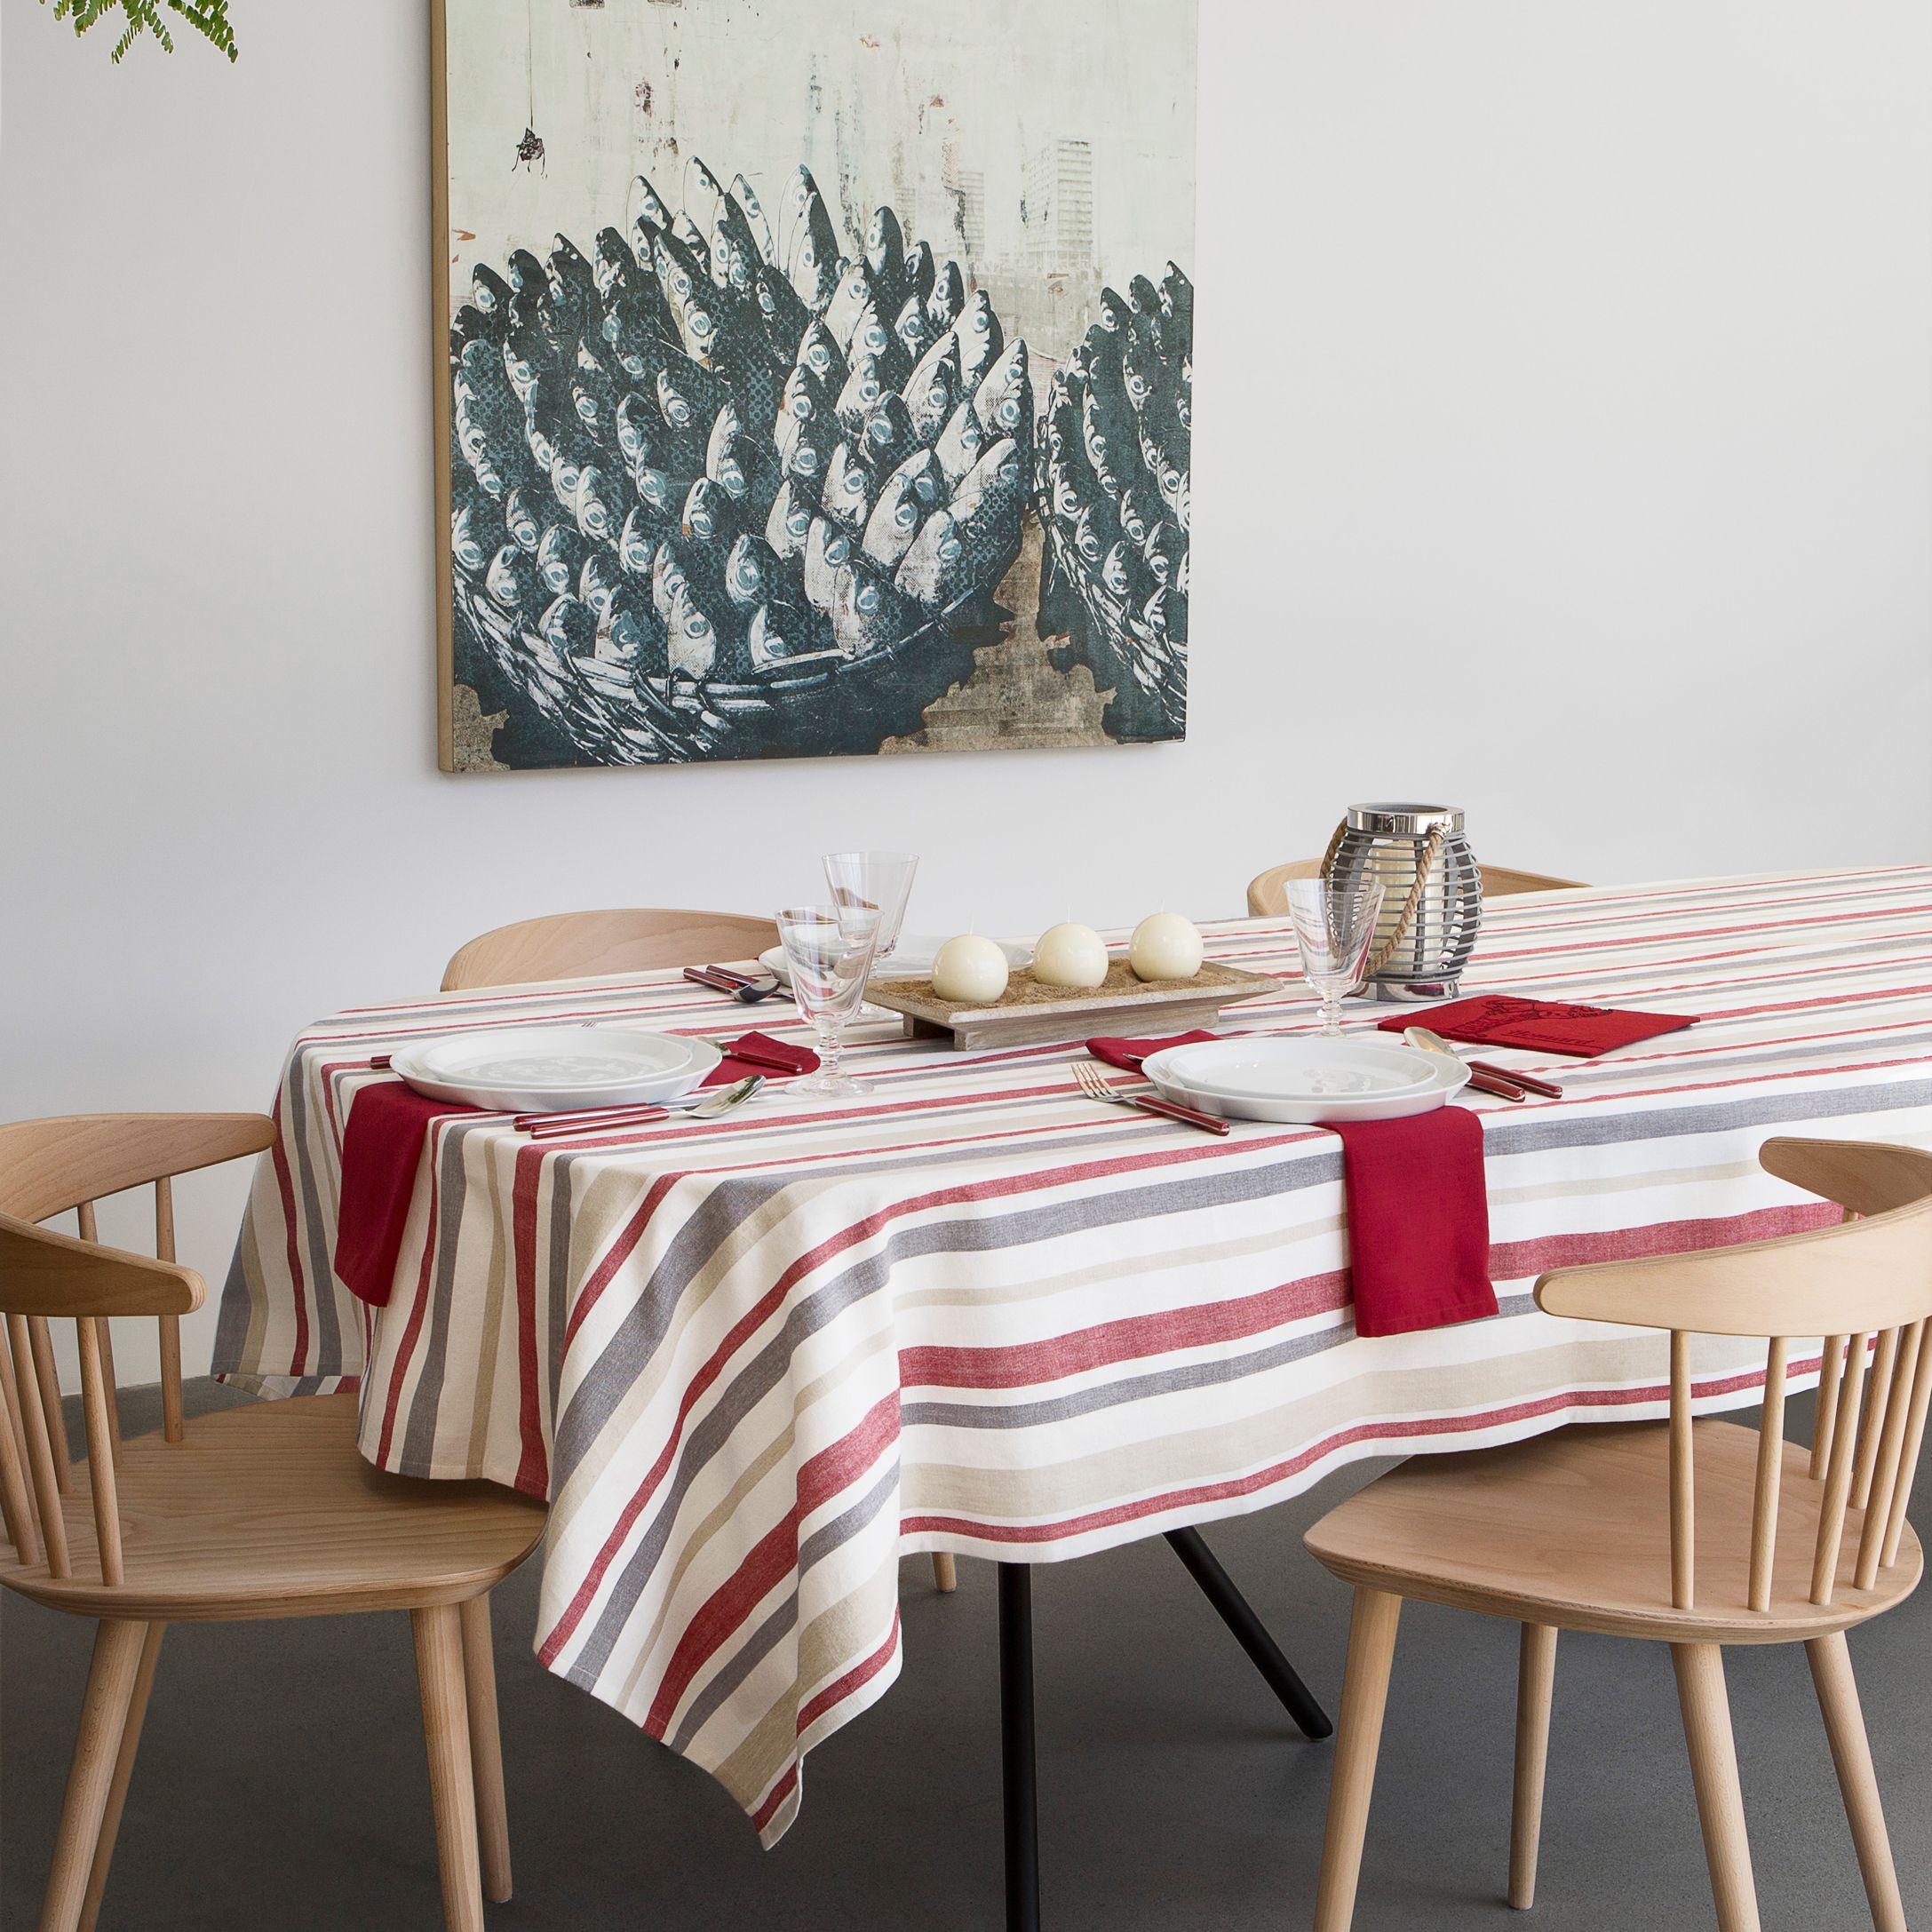 MARTHAu0027S VINEYARD TABLECLOTH | Simons #countryclub #nautical #tablecloth  #stripes #kitchen #